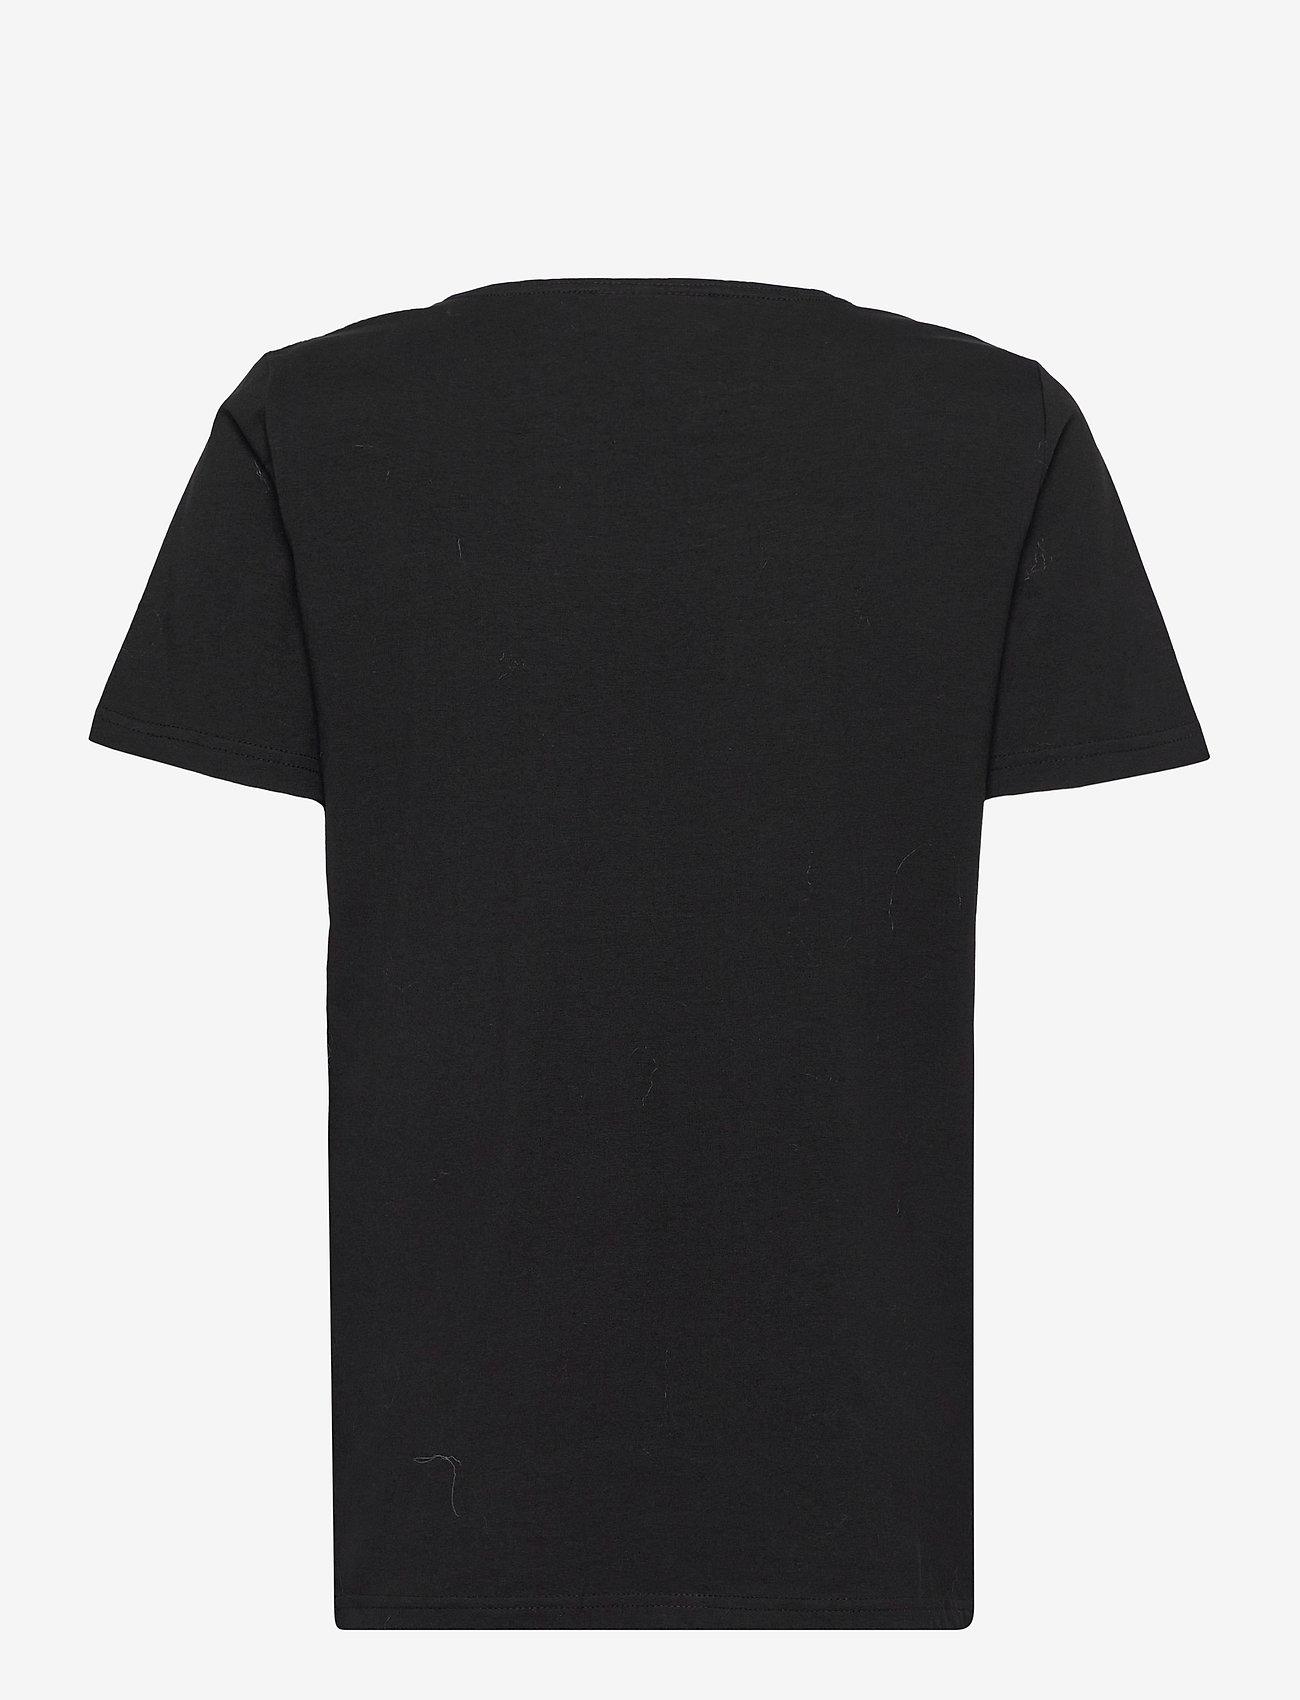 FREE/QUENT - FQANJA-TEE - t-shirts - black mix - 1